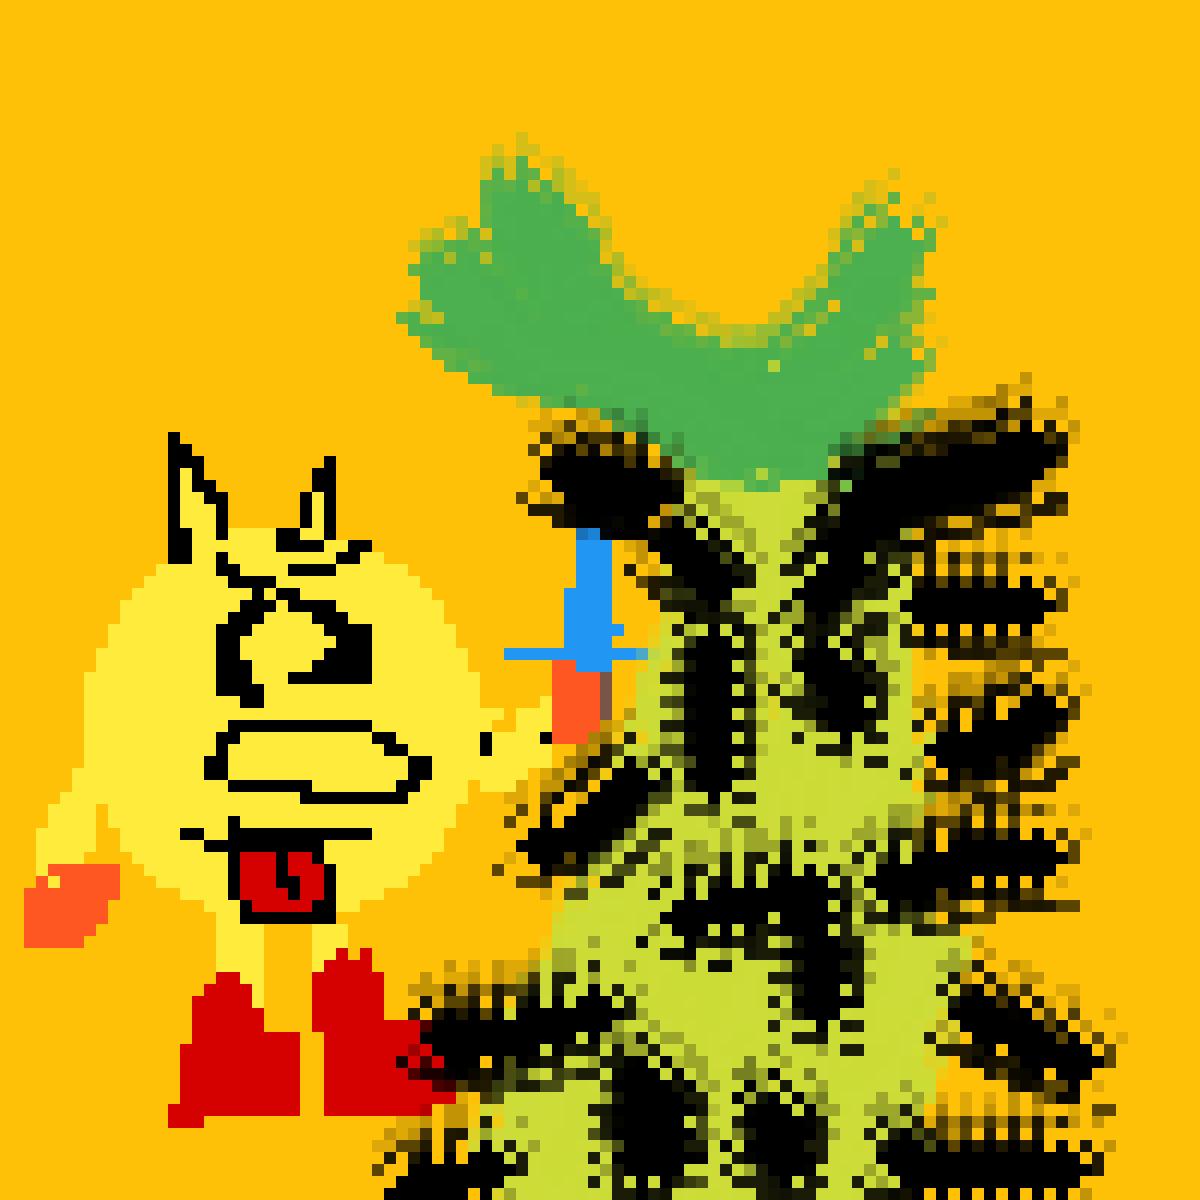 Pacman vs Pineapple by Mariosonic1232